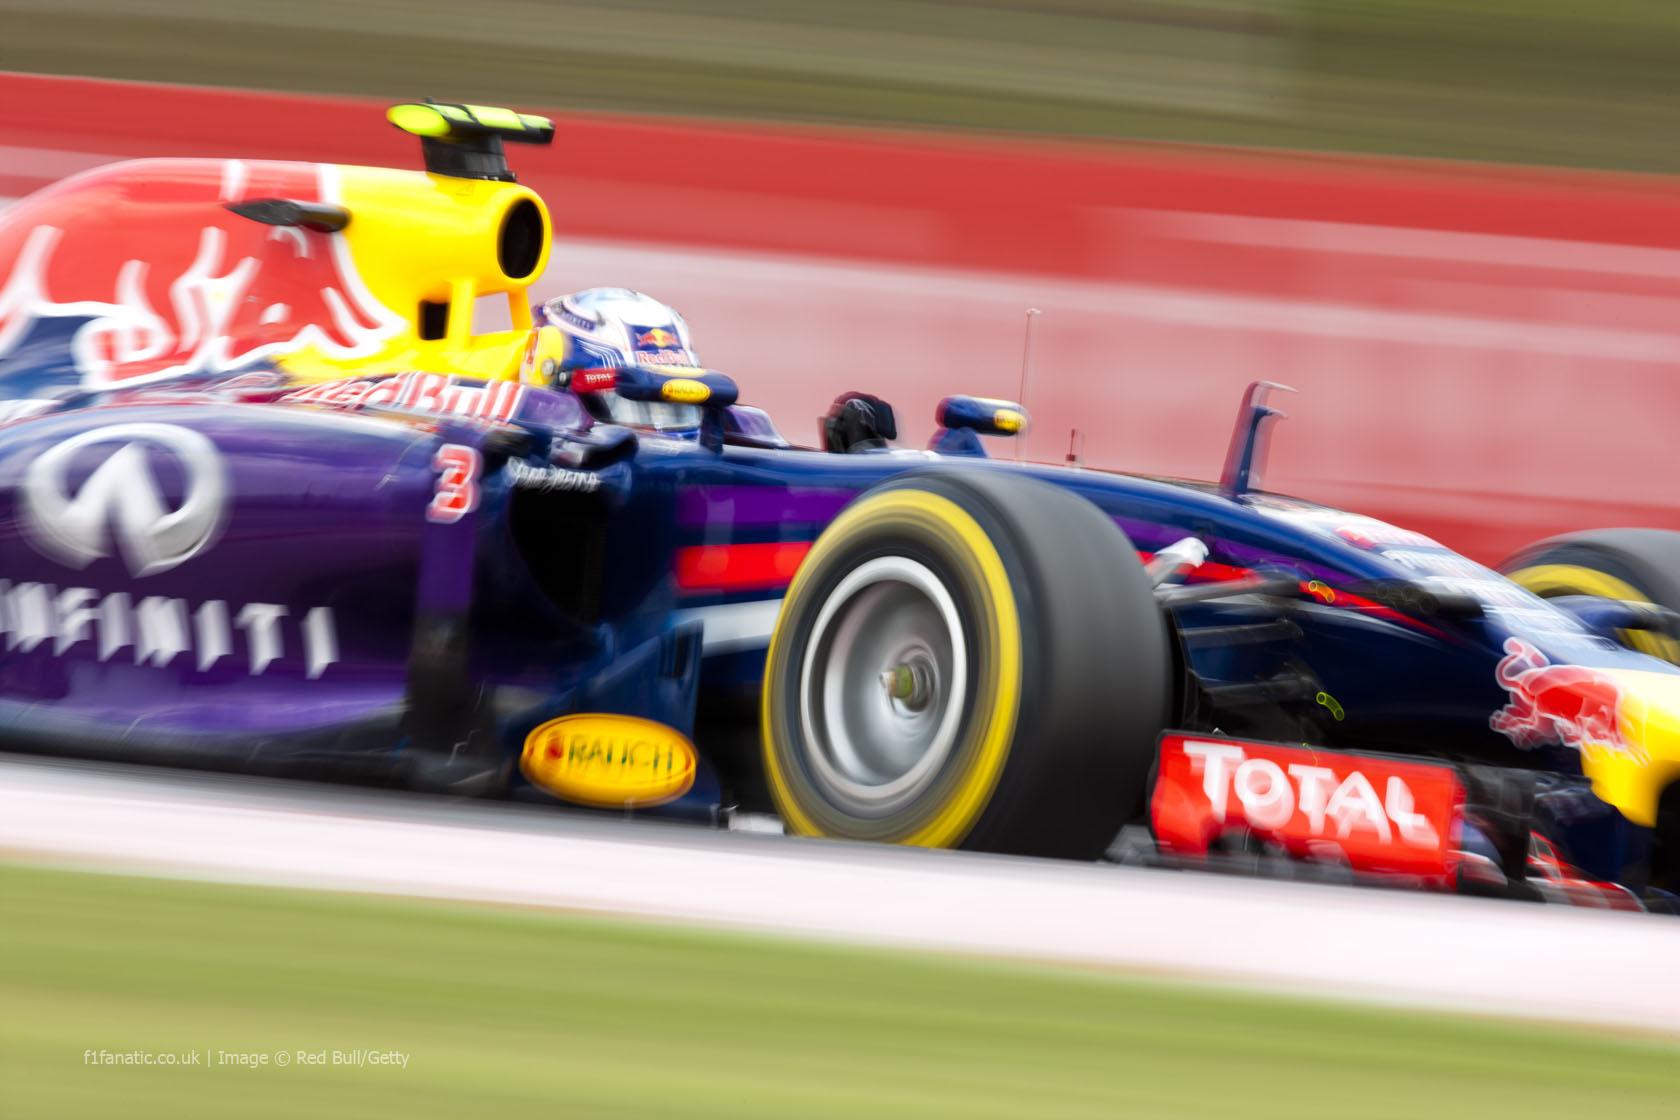 Daniel Ricciardo, Red Bull, Hockenheimring, 2014